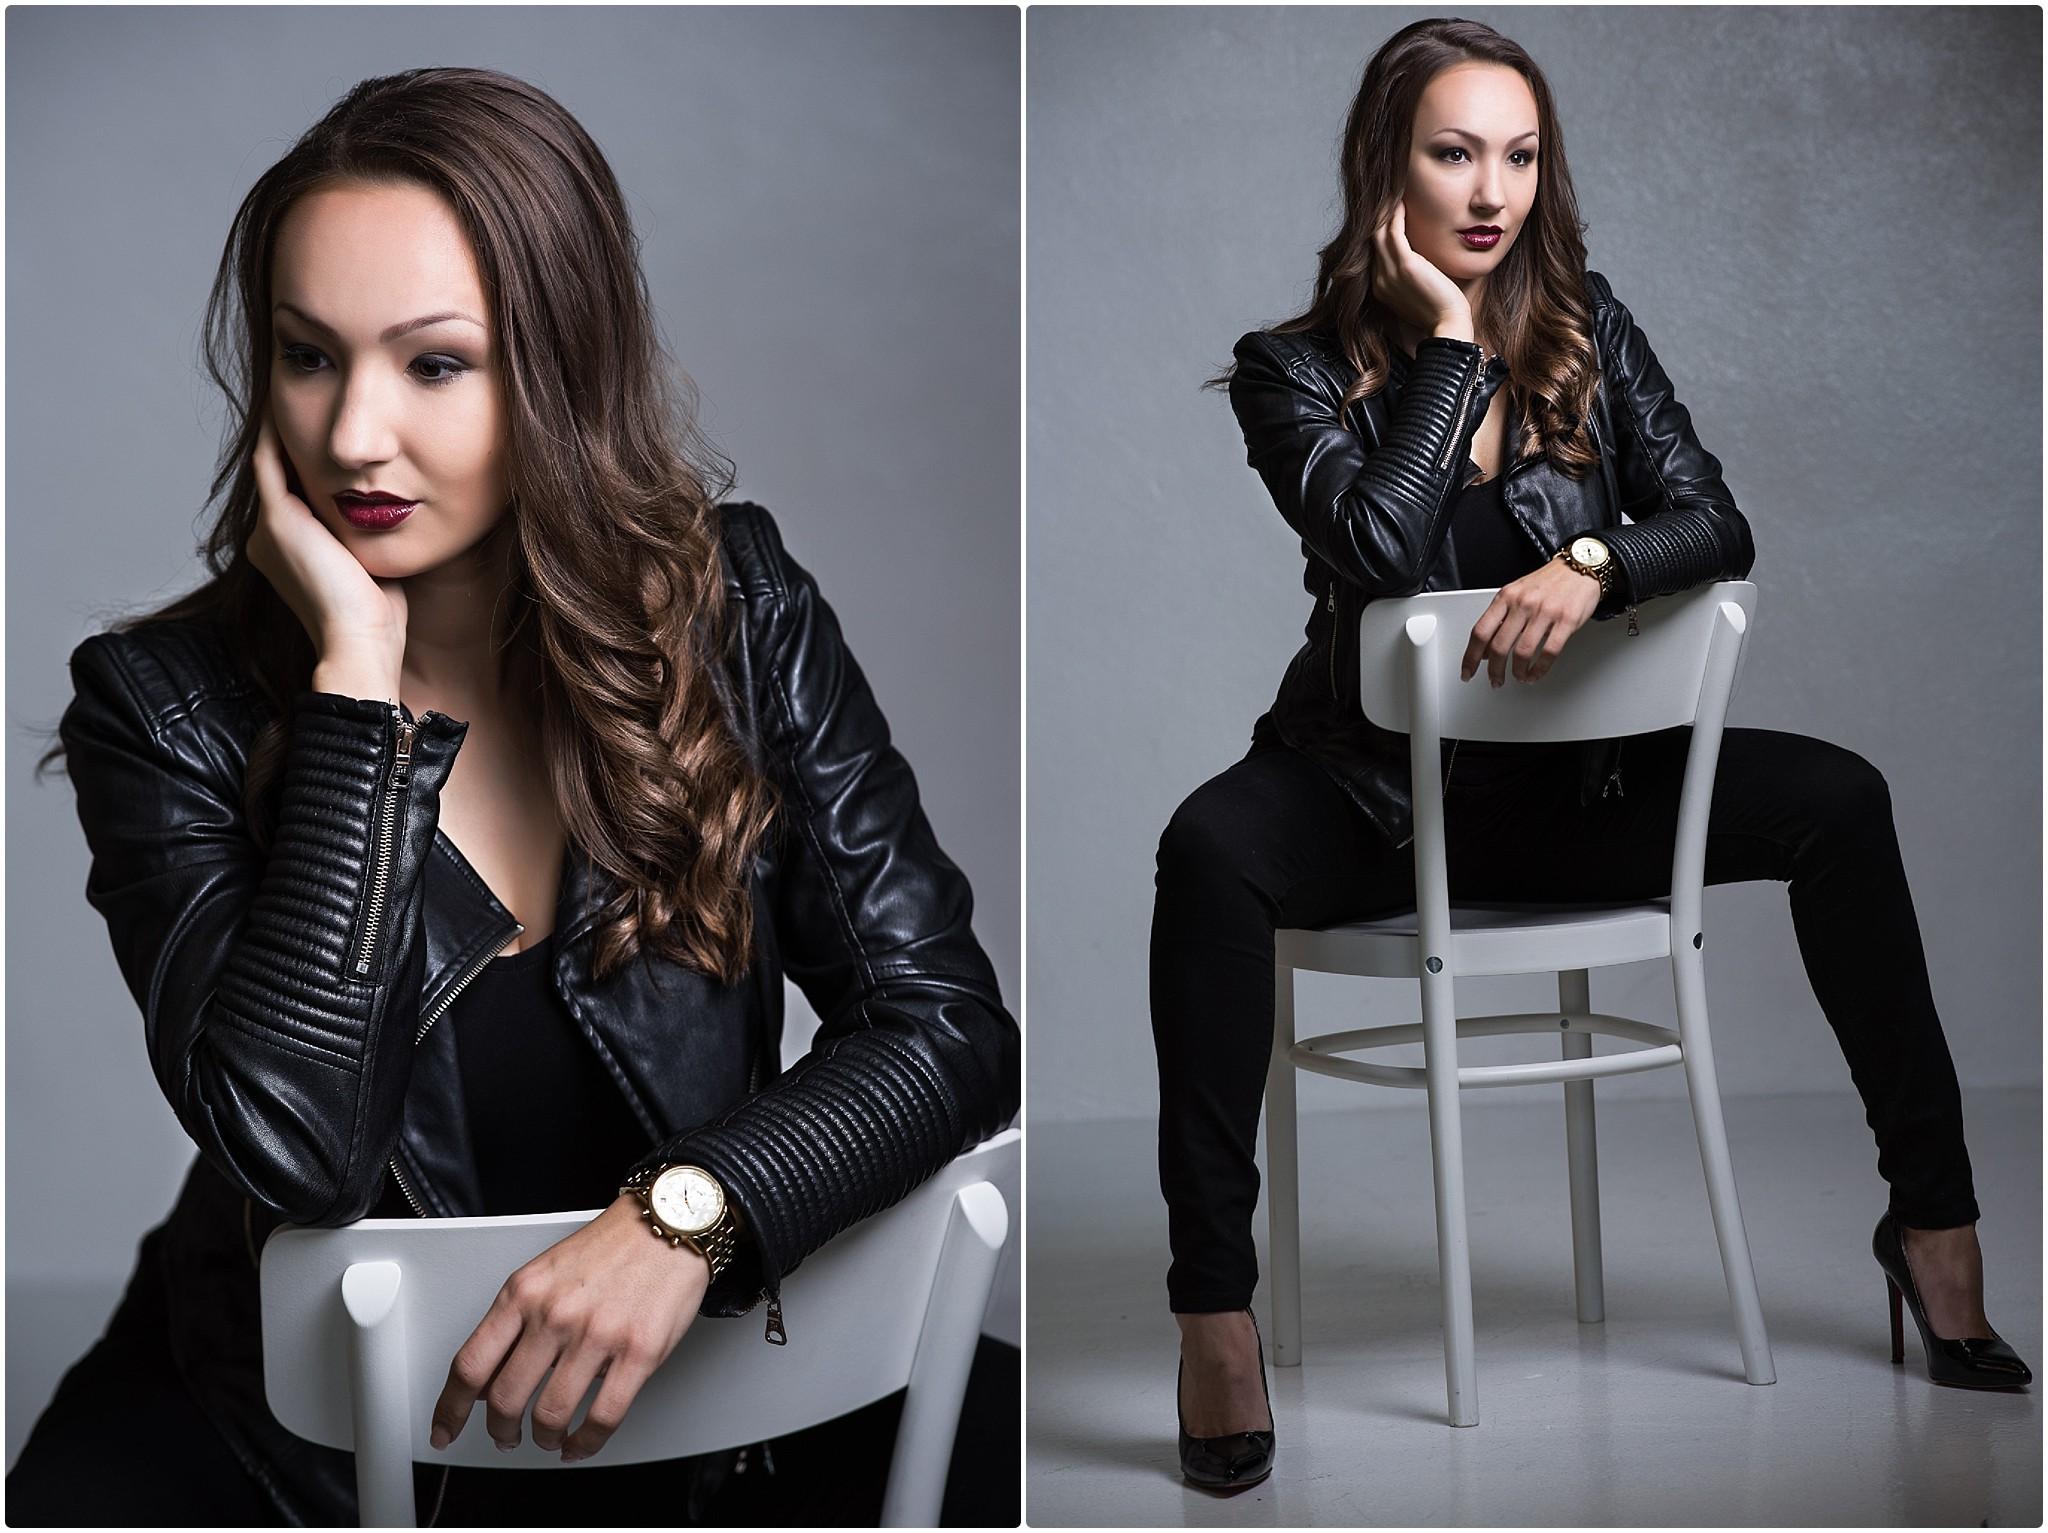 fotograf_fotoshooting_zuerich_girl_modelshooting_dsc5174-bearbeitet